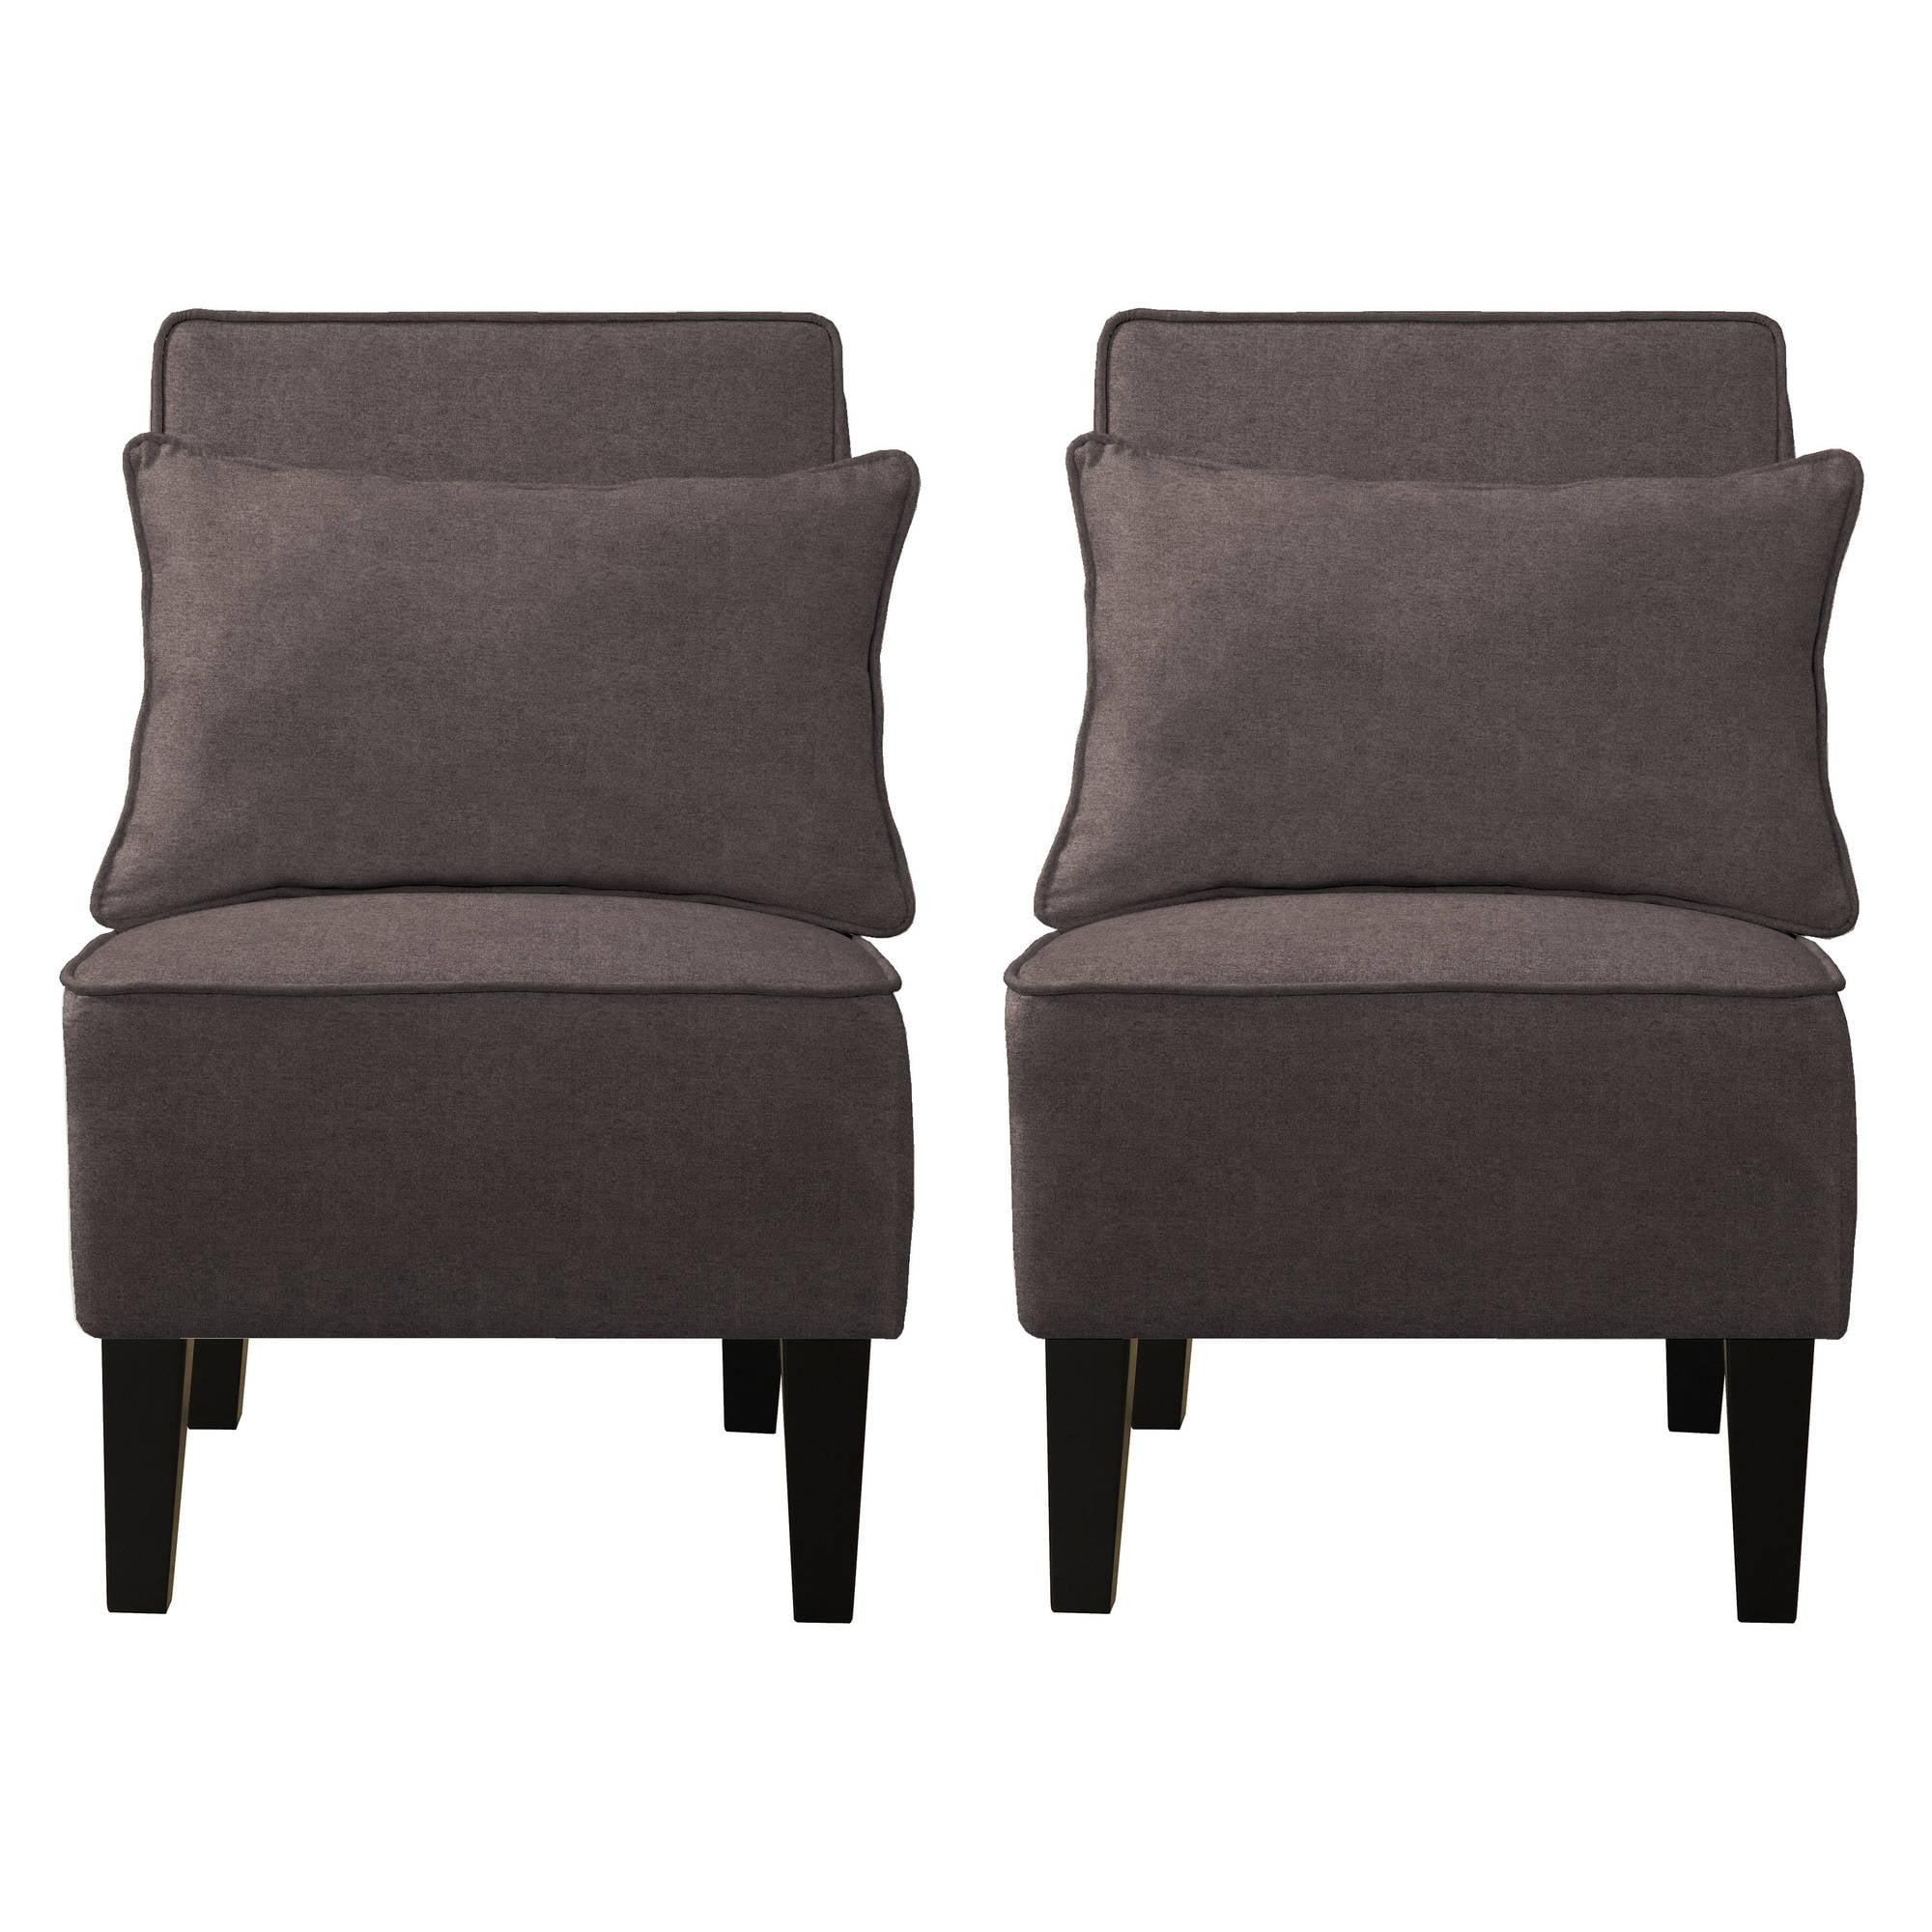 apartment AH Jules Chair Set, Parisian Smoky Grey